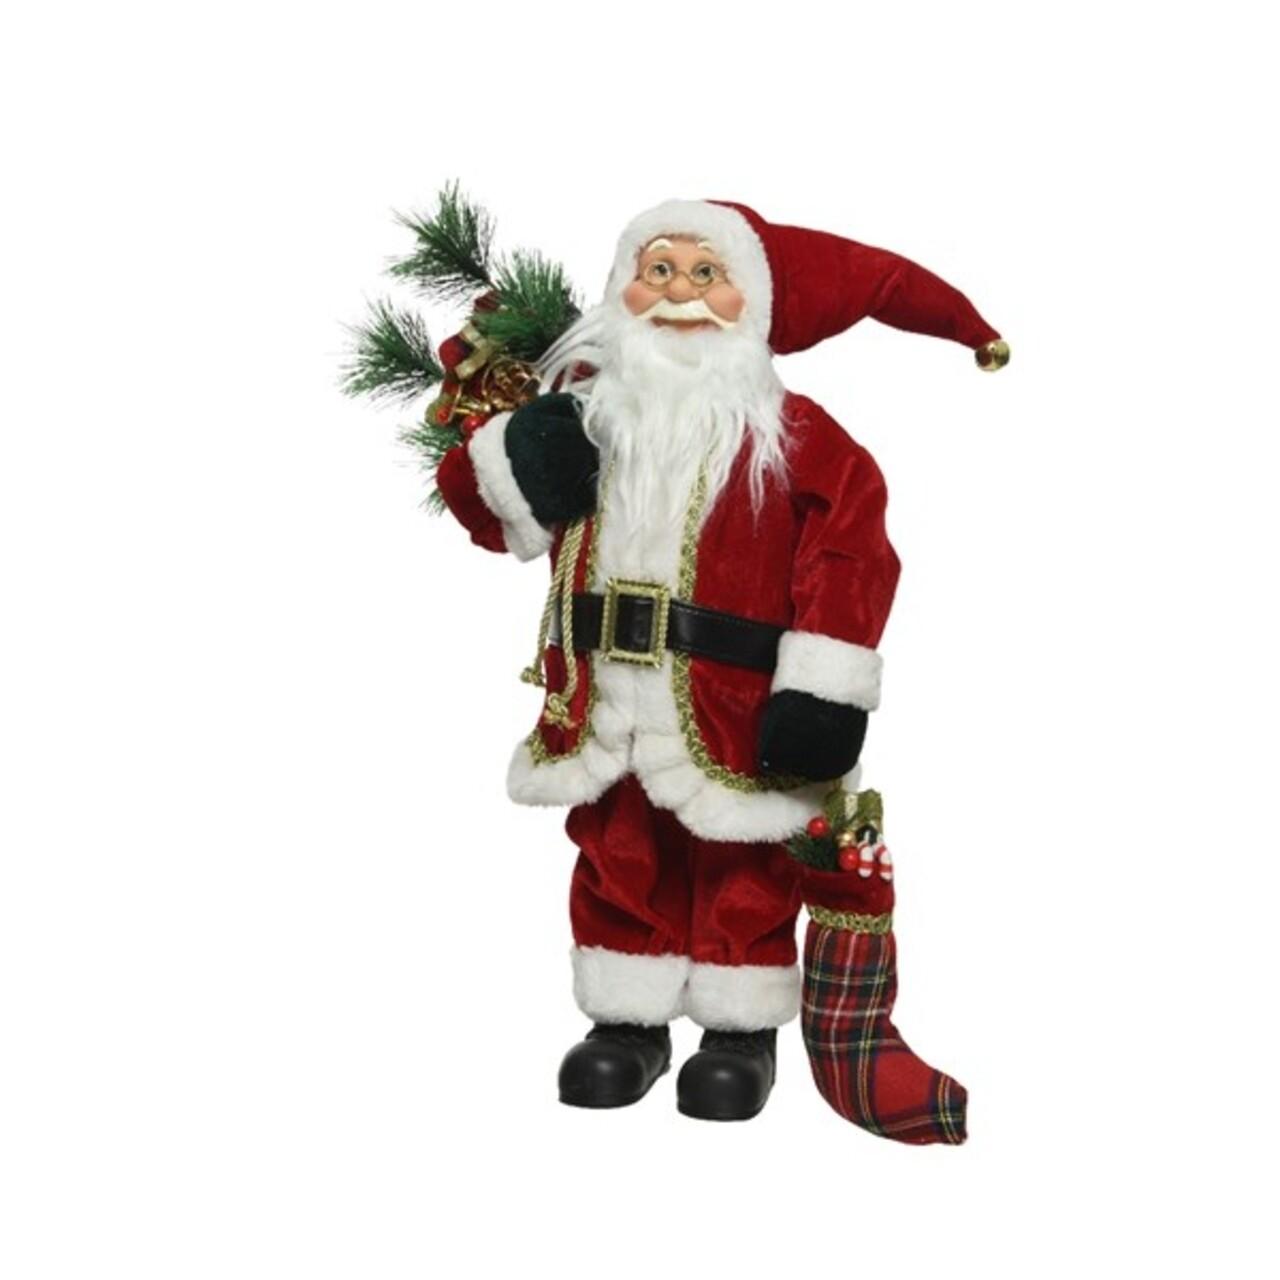 Decoratiune Classic Santa w stocking, Decoris, H60 cm, poliester, rosu